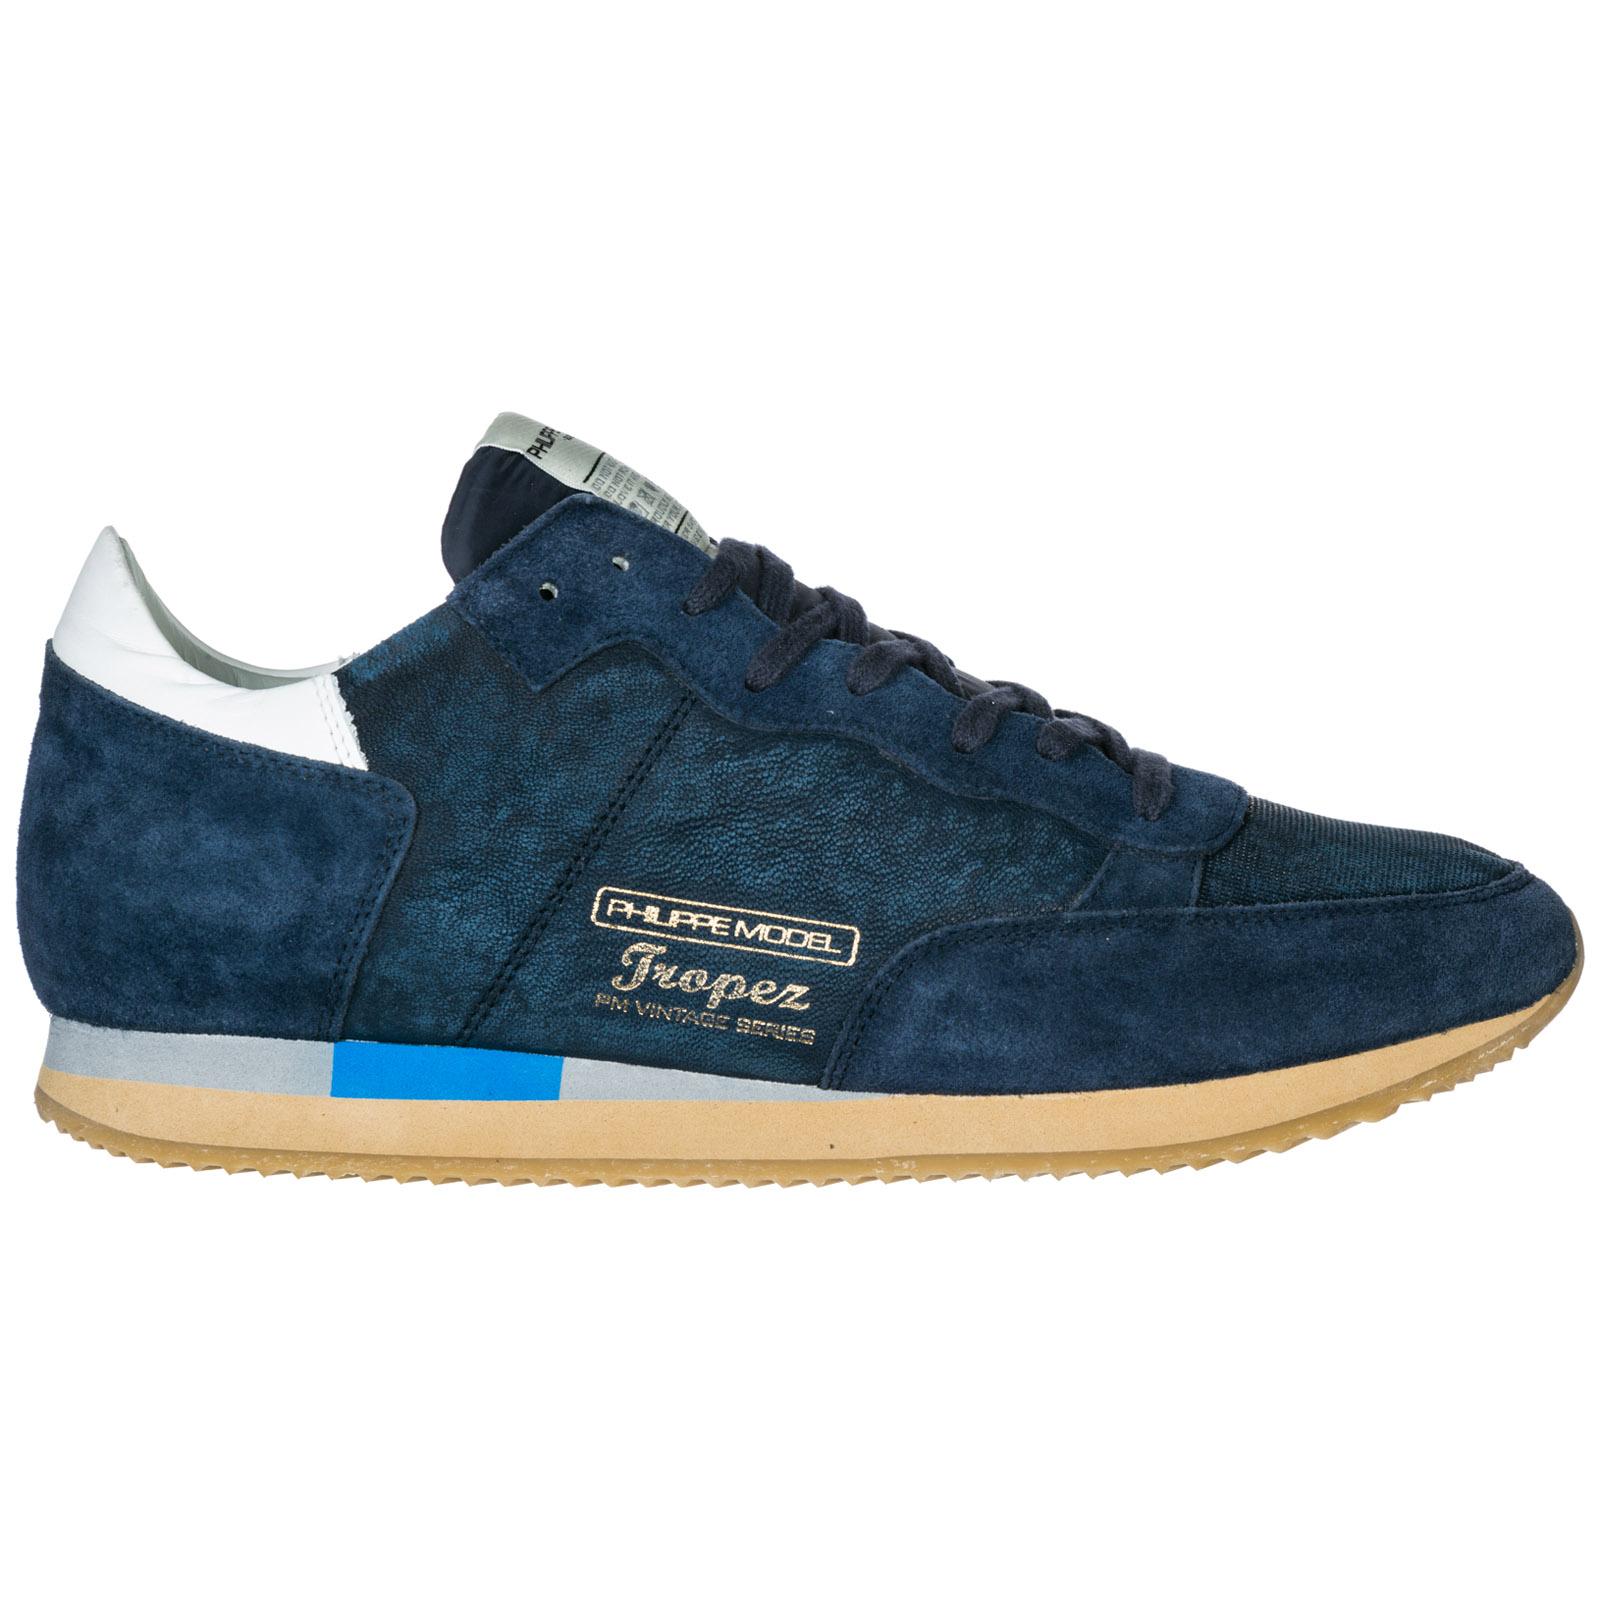 268b2faaebcd0 Men's shoes suede trainers sneakers tropez vintage